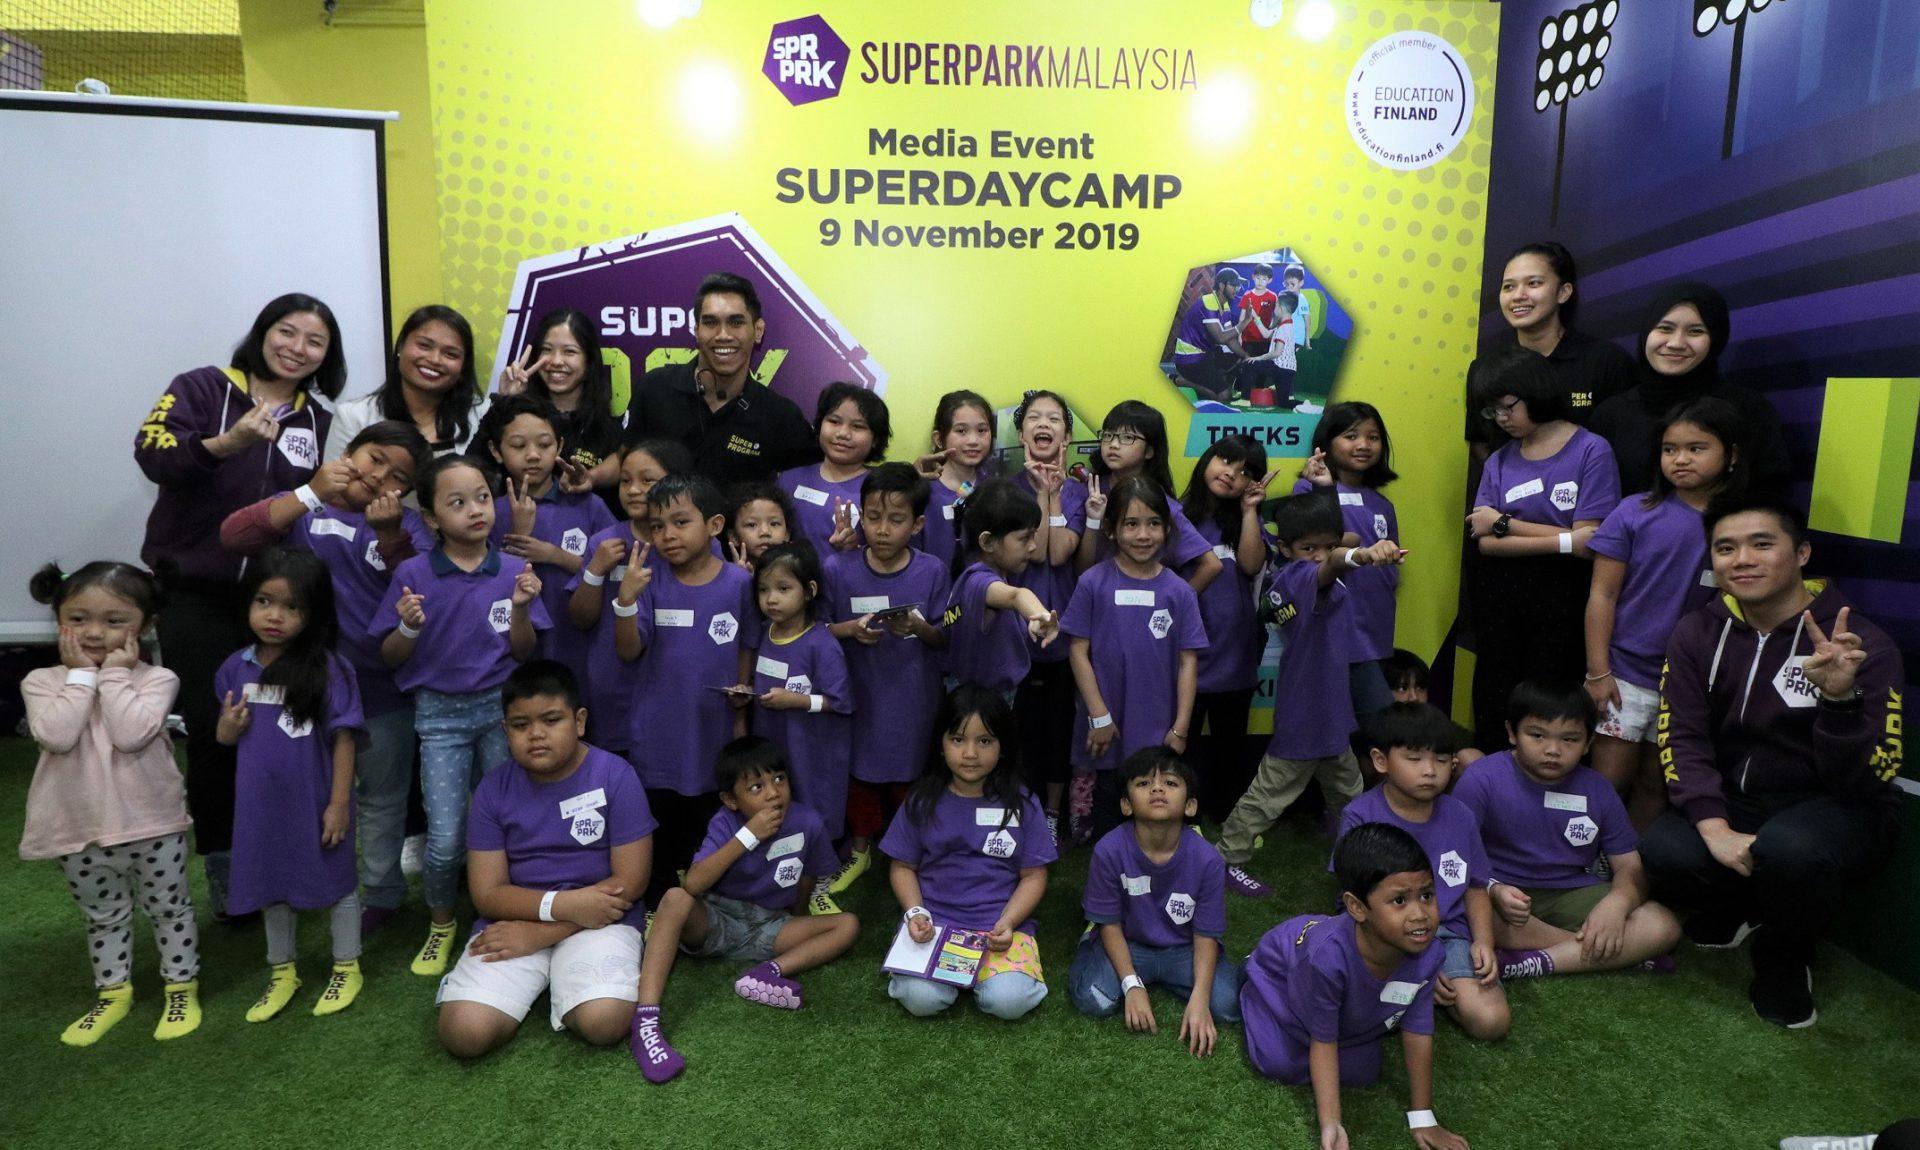 Bermain Cara Selamat Bak Anak-anak Finland Di SuperDay Camp, SuperPark Malaysia